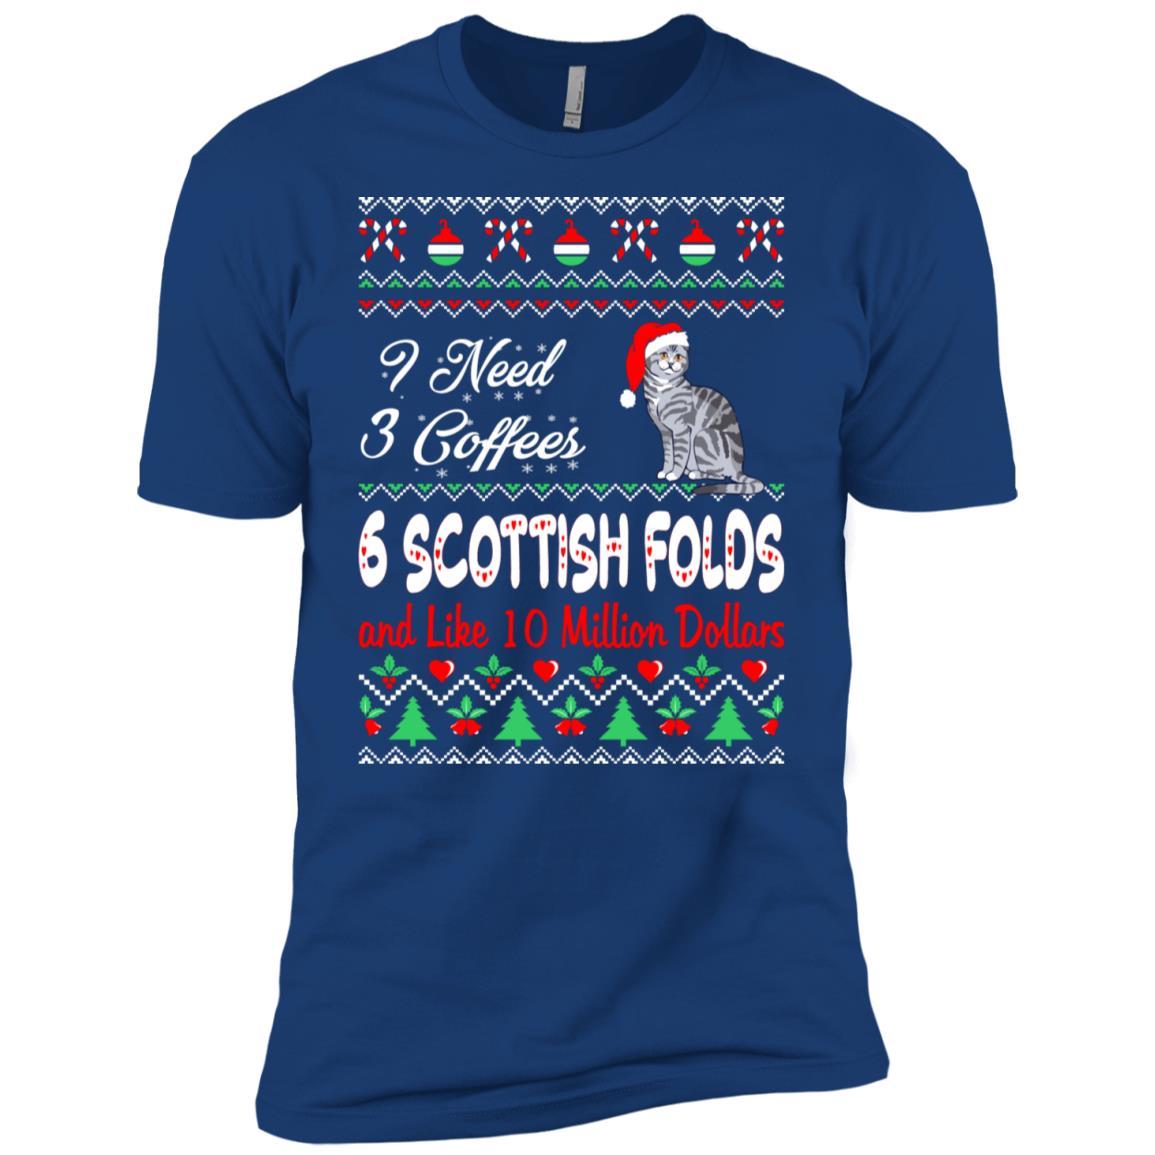 Need 3 Coffees 6 Scottish Folds Christmas Ugly Sweater Tees Men Short Sleeve T-Shirt